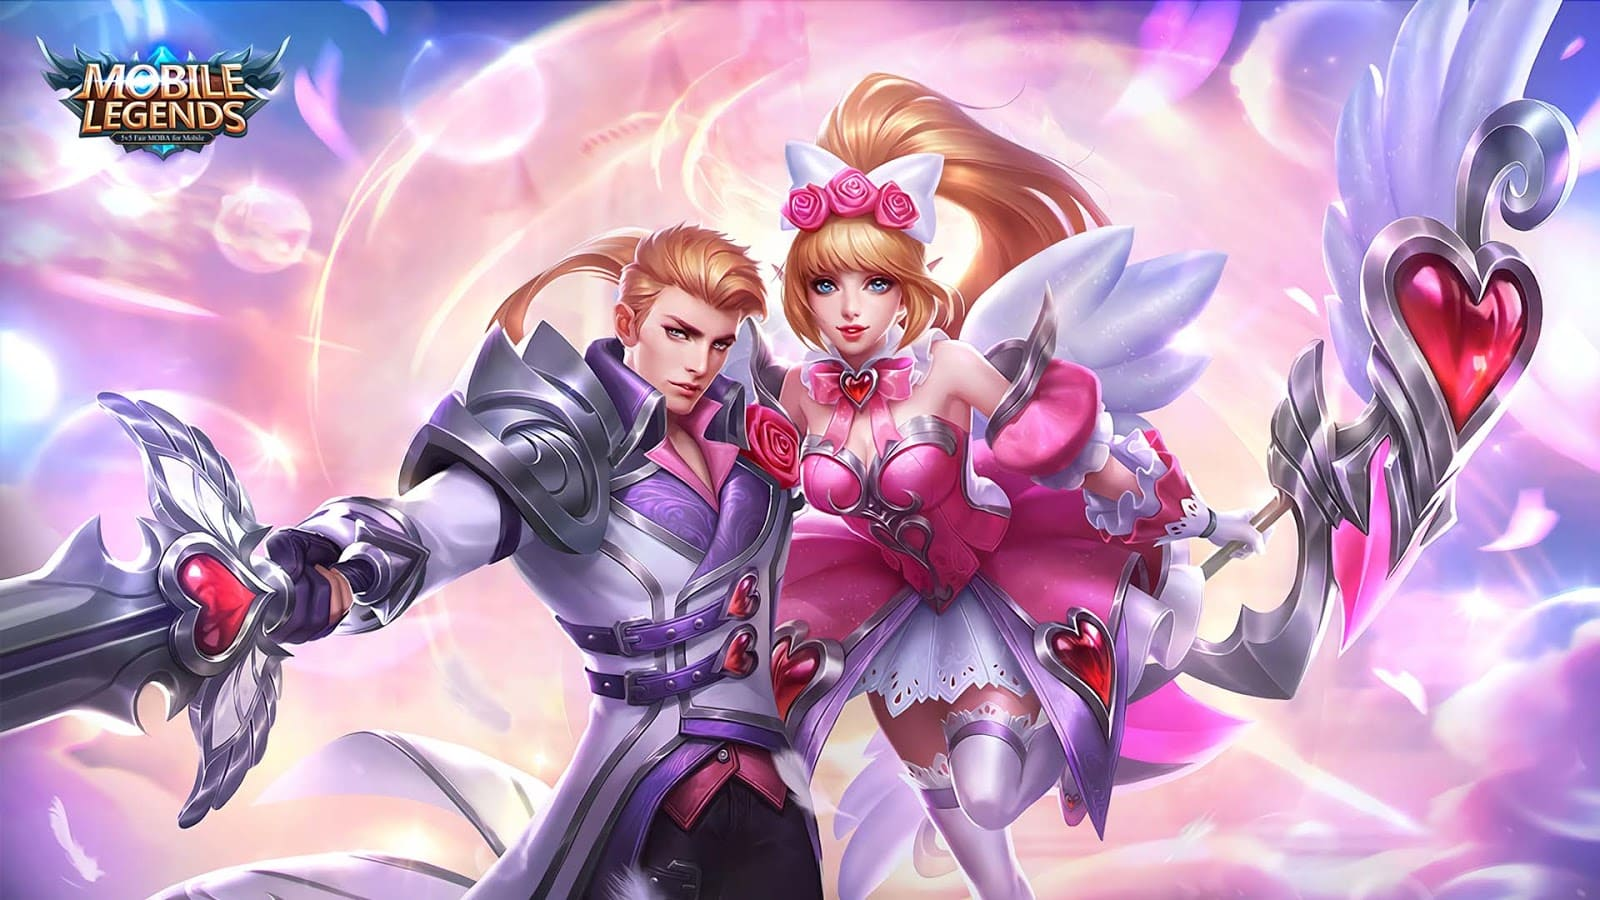 Wallpaper Alucard and Miya Romantic Fantasy Skin Mobile Legends HD for PC - Hobigame.net